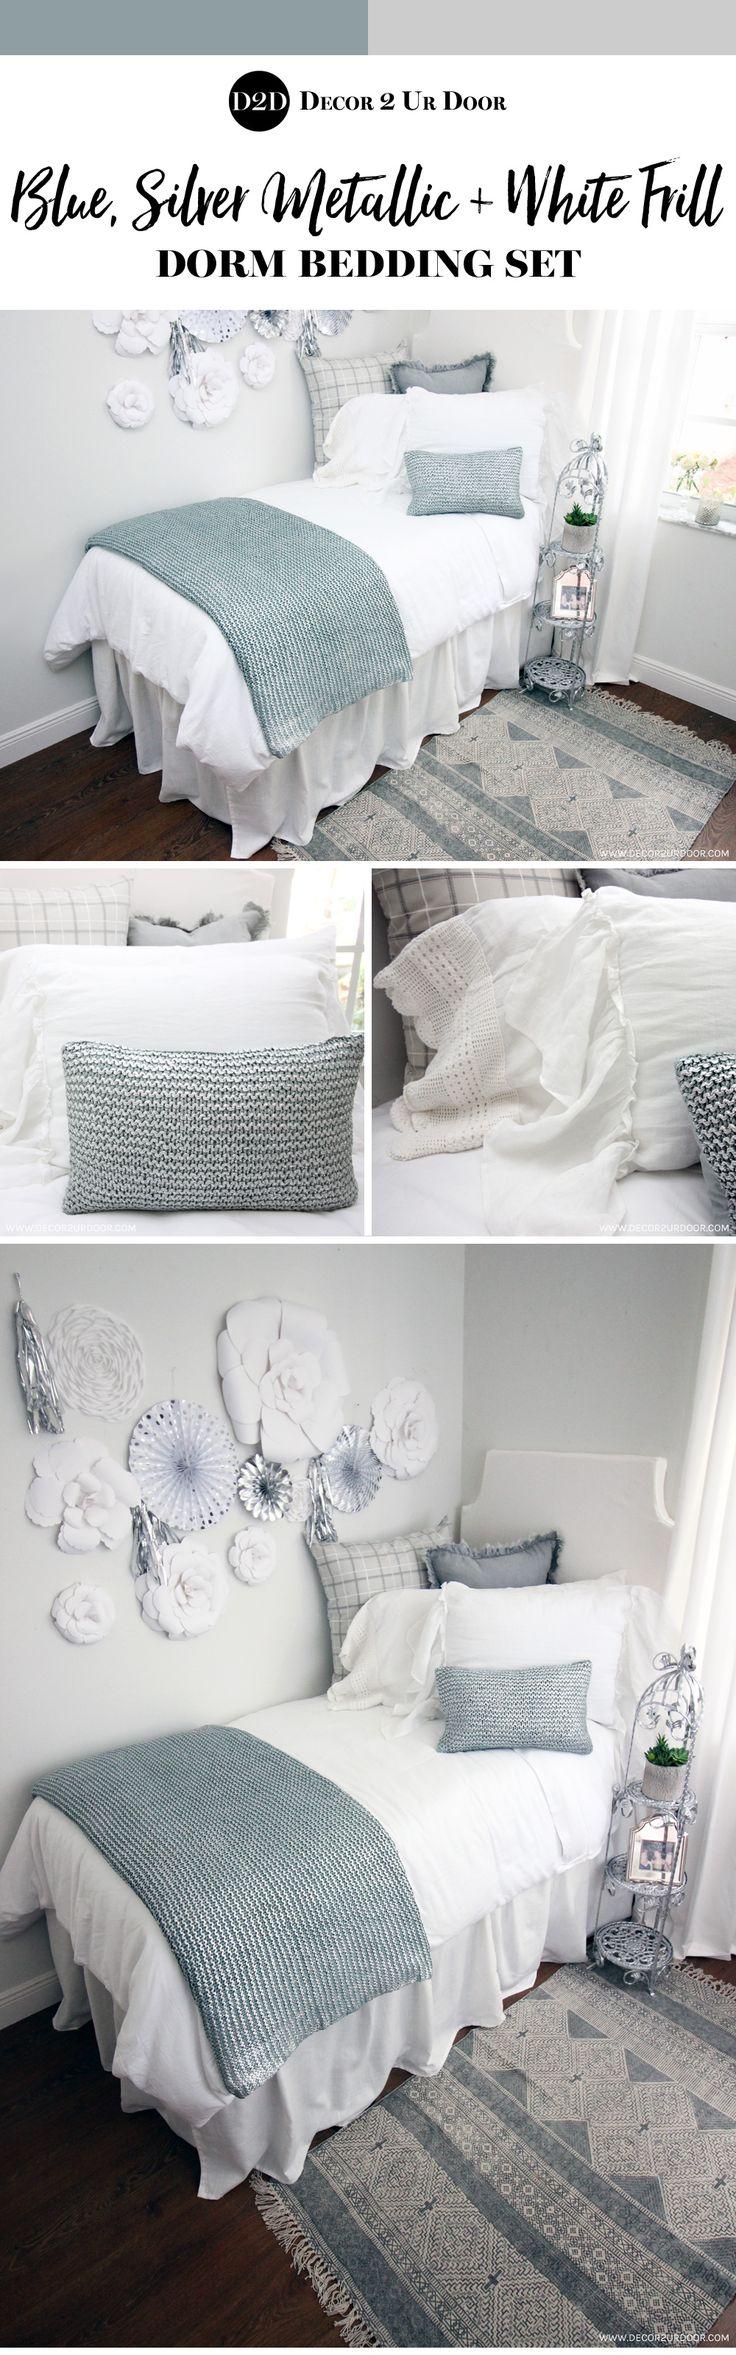 Best 869 Best College Dorm Room Ideas Images On Pinterest 640 x 480